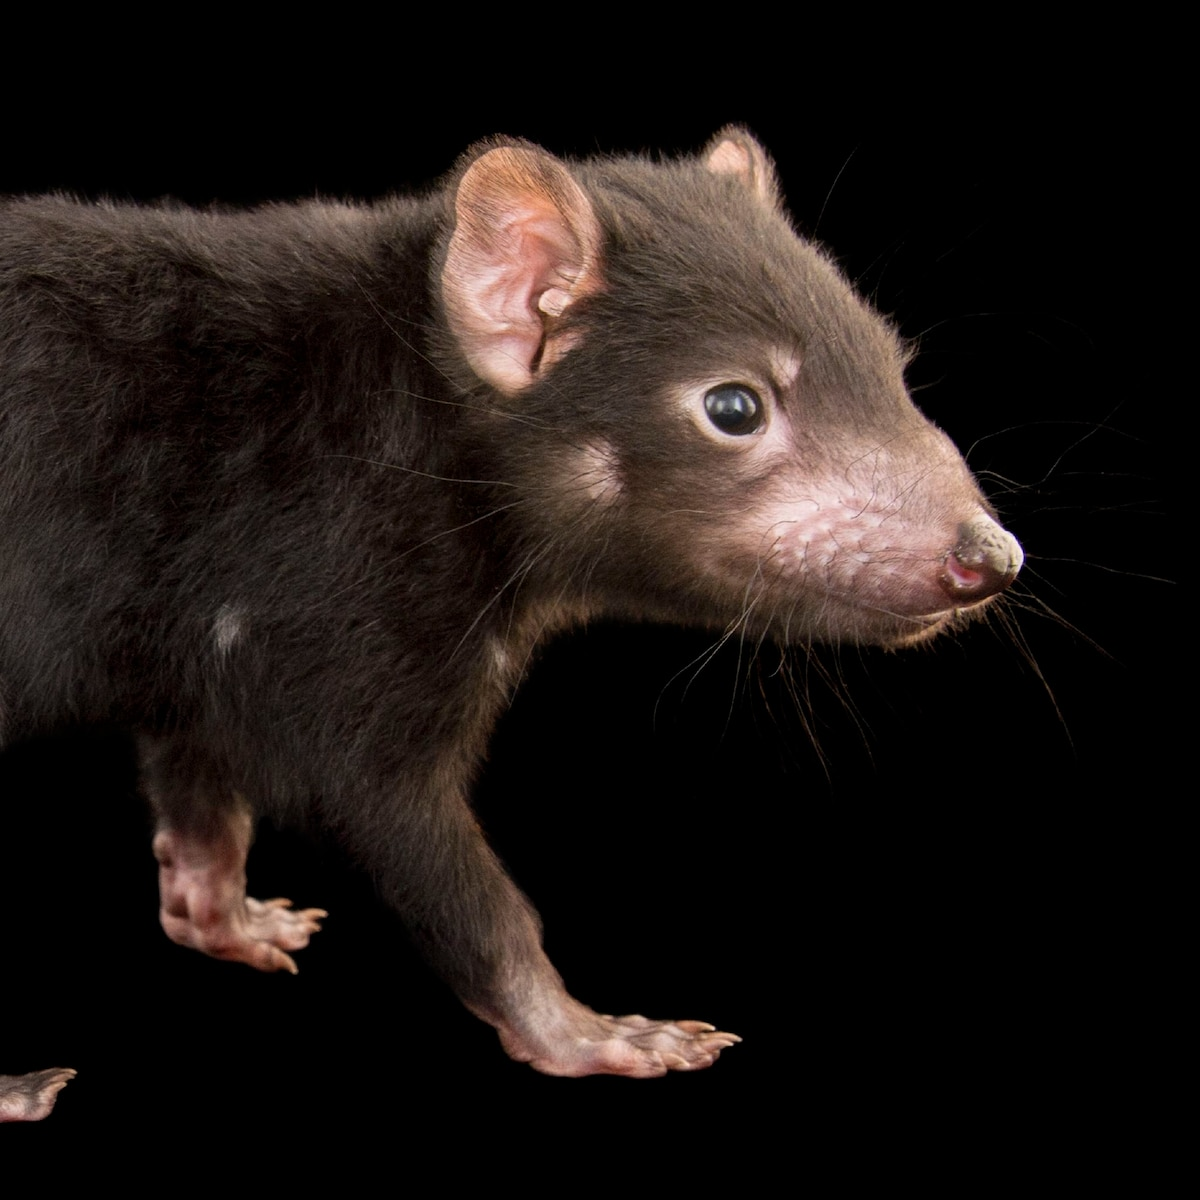 Tasmanian devil, facts and photos